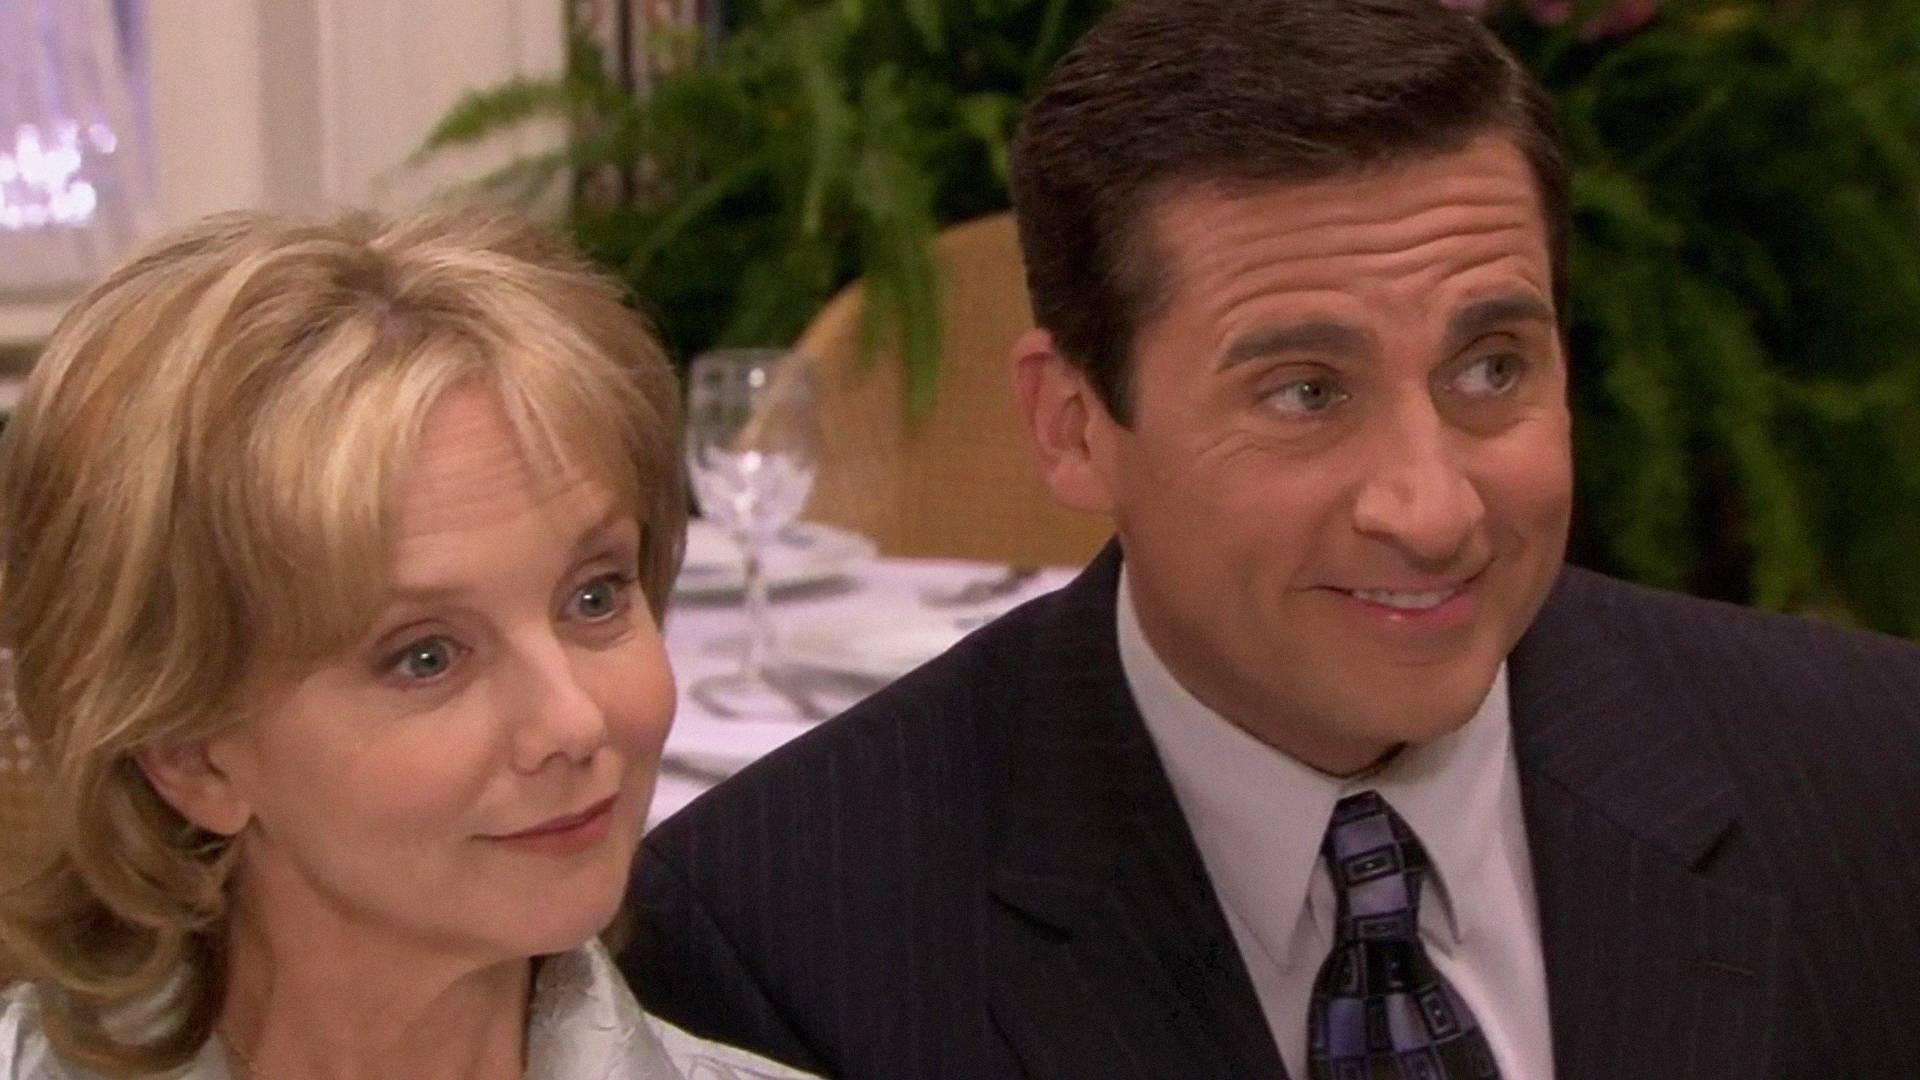 The Office Season 6 Episode 9